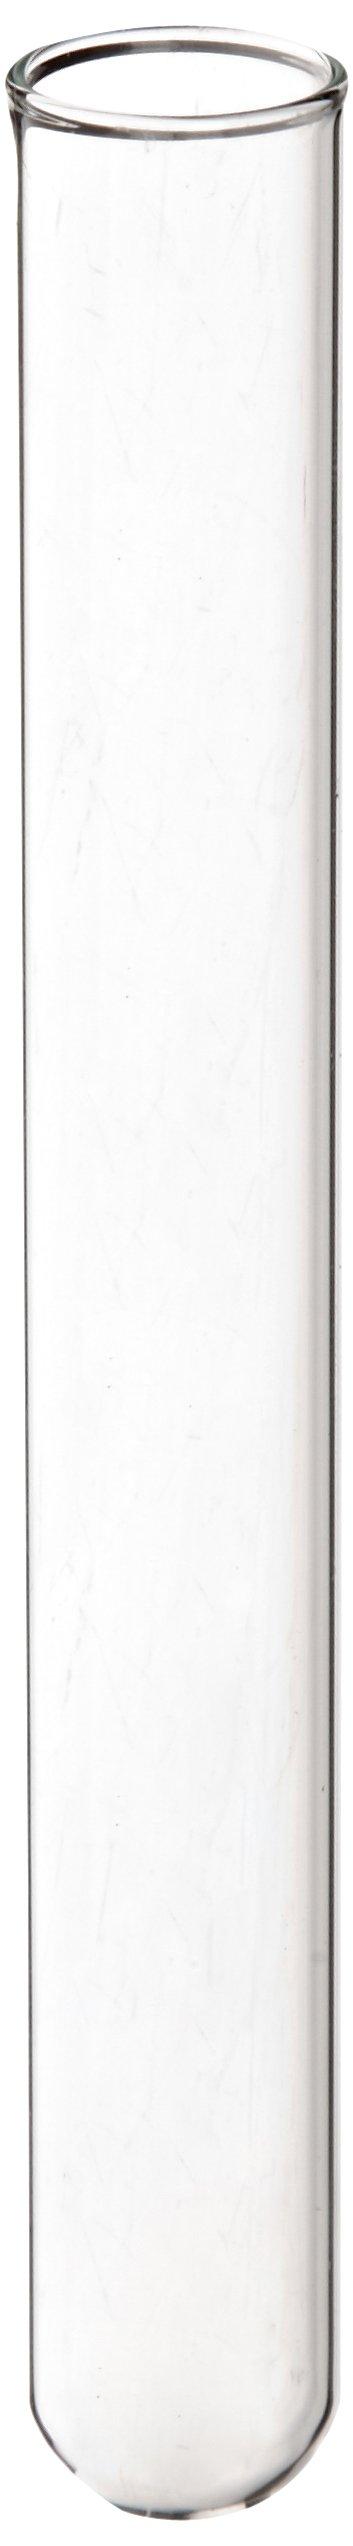 Kimble 73500-13100 N-51A Borosilicate Glass Culture/Test Tube, with Rim Top (Case of 1000)